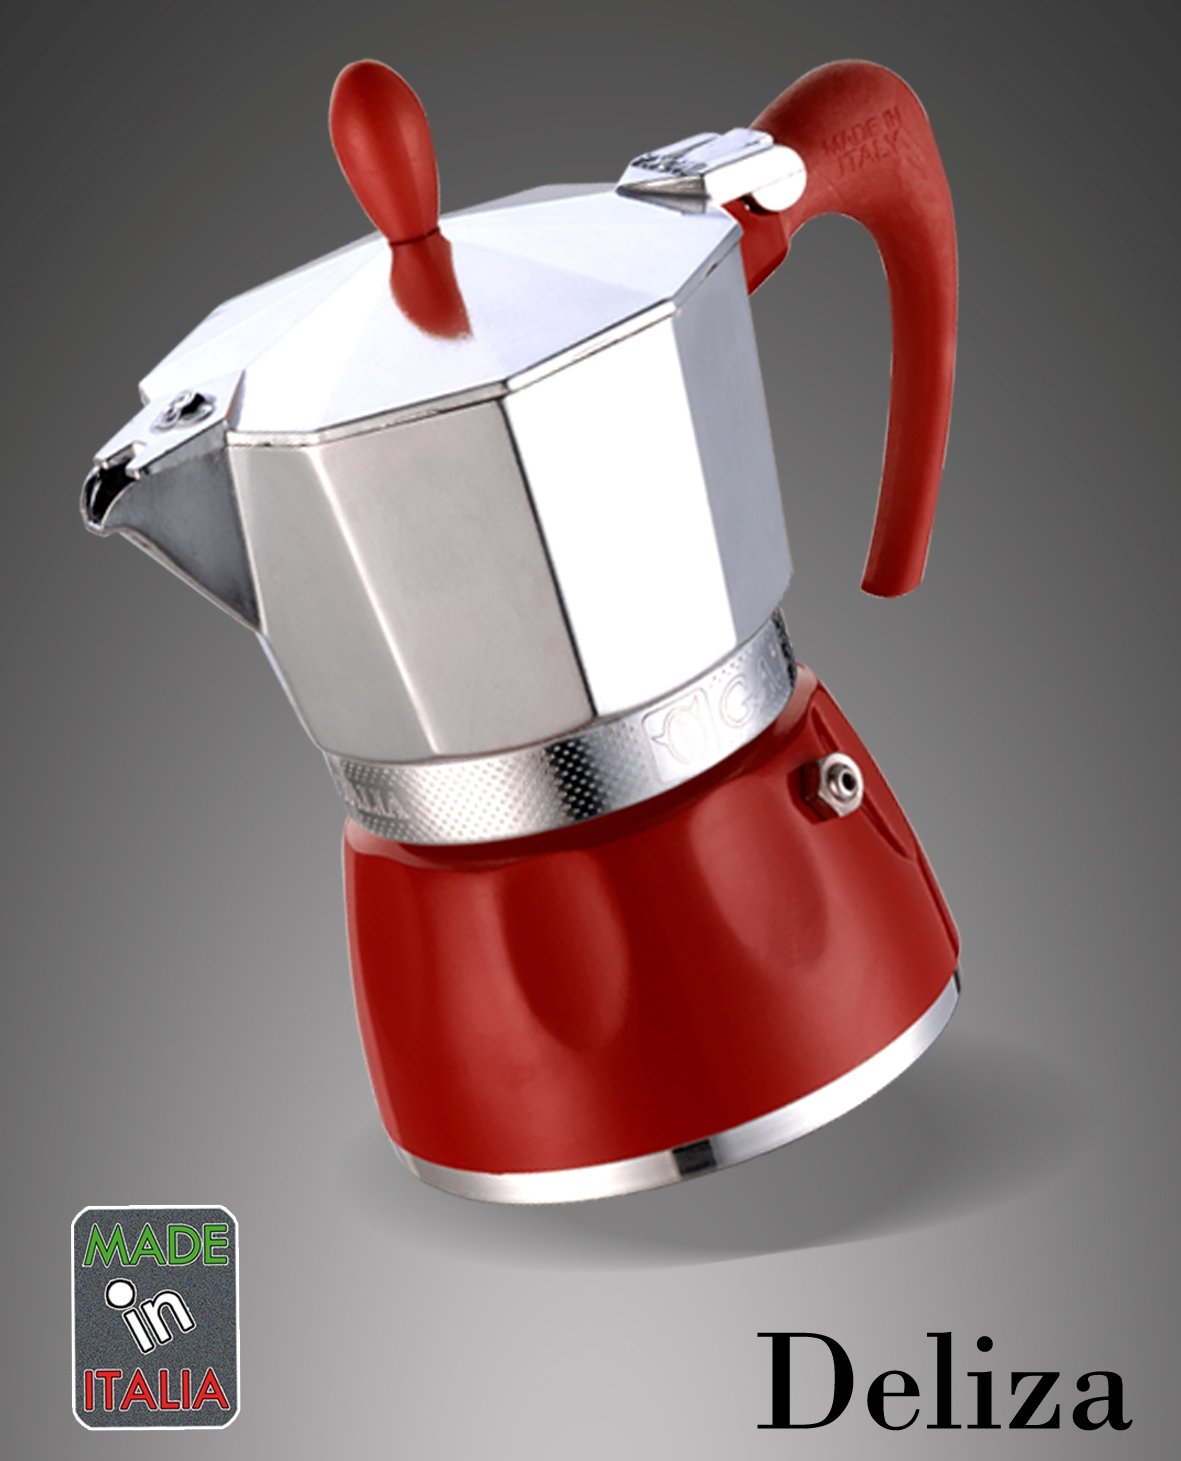 Espressokocher Delizia 9 Tassen rot